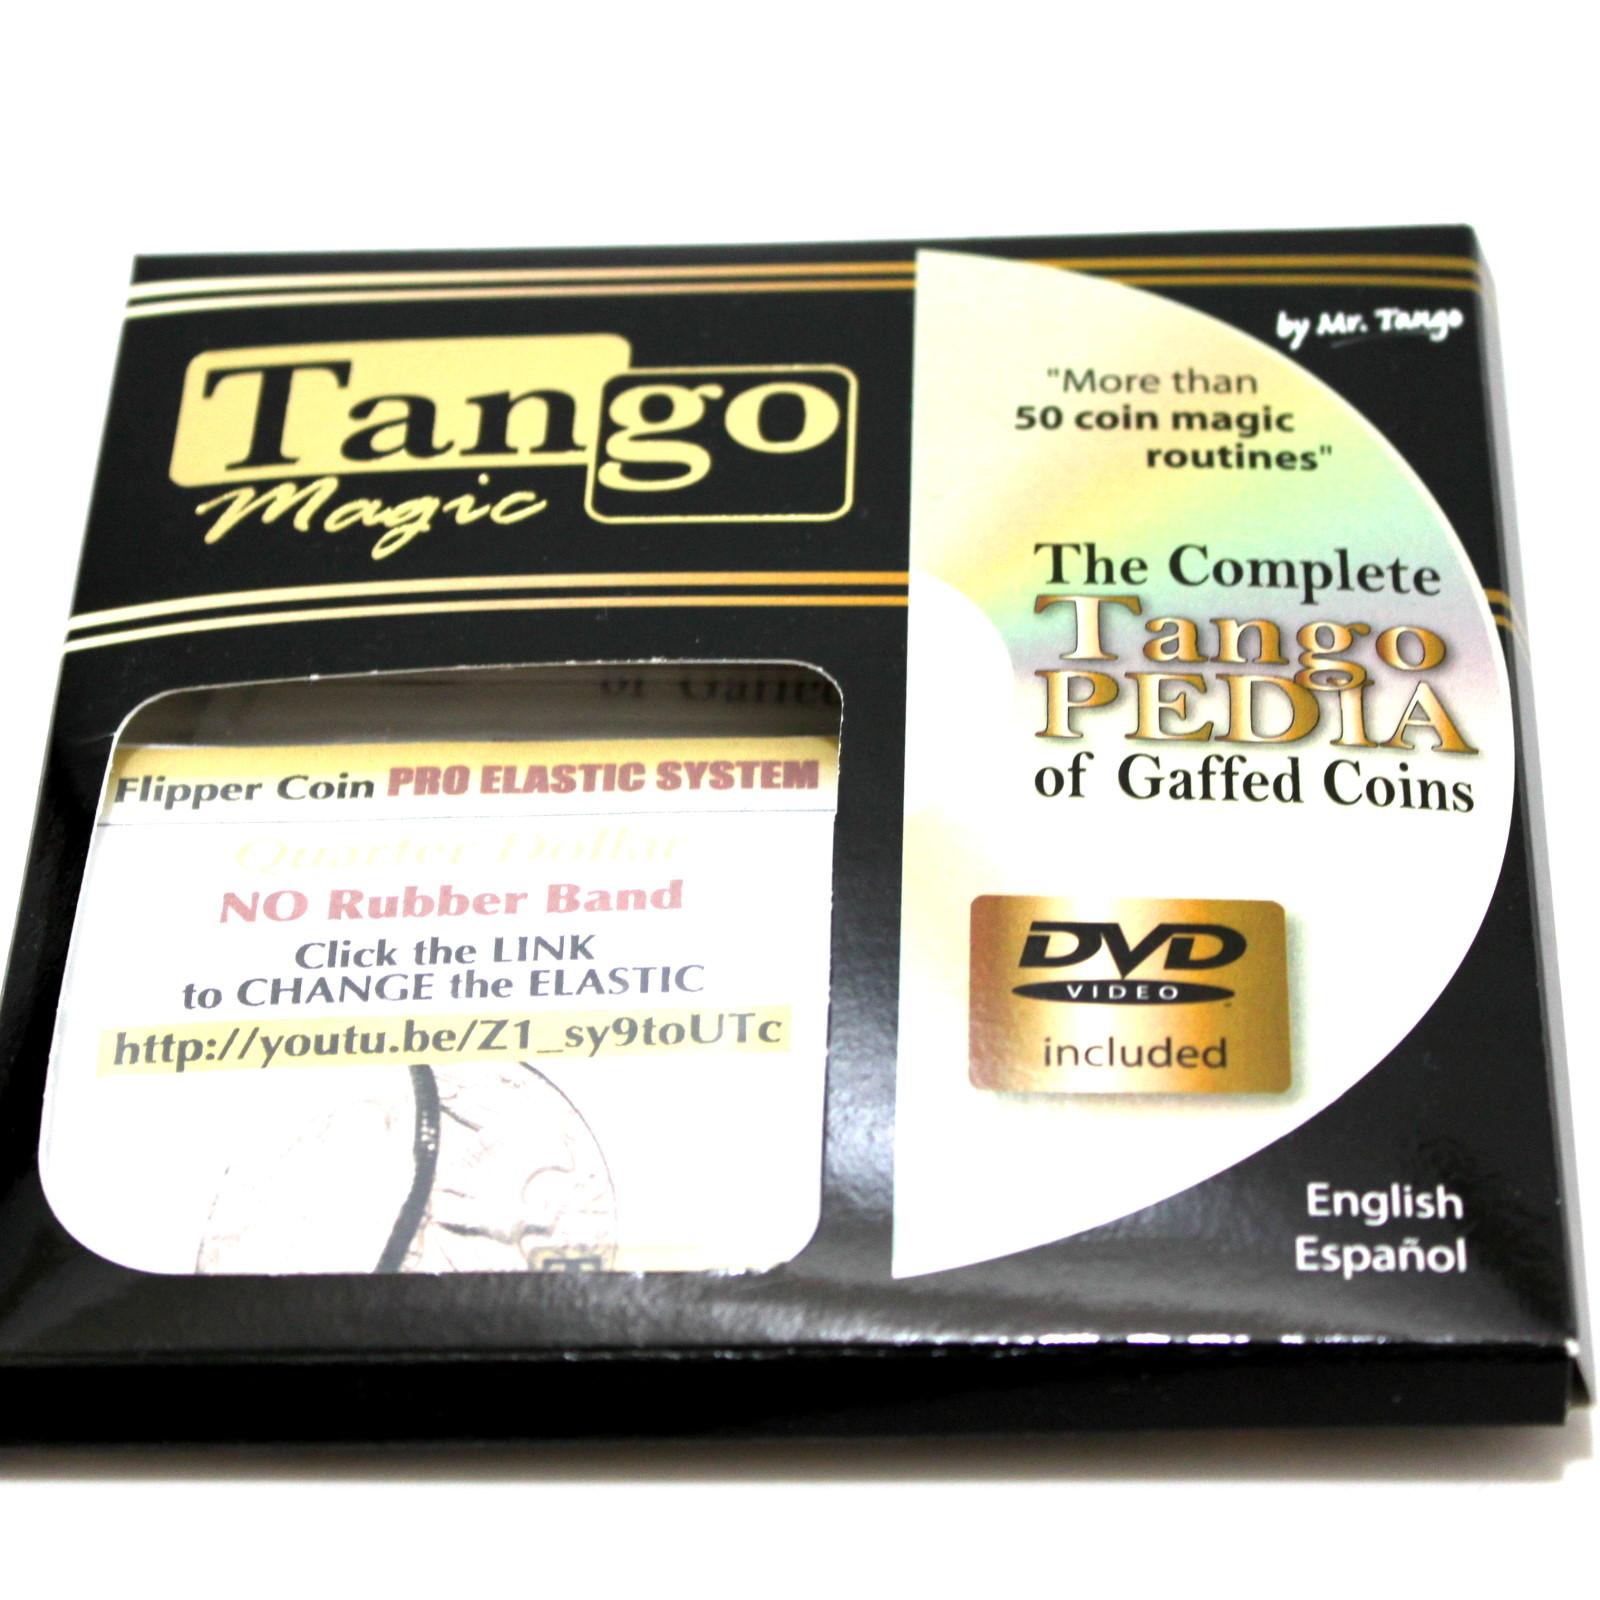 Pro Elastic System Flipper Coin (Quarter) by Tango Magic